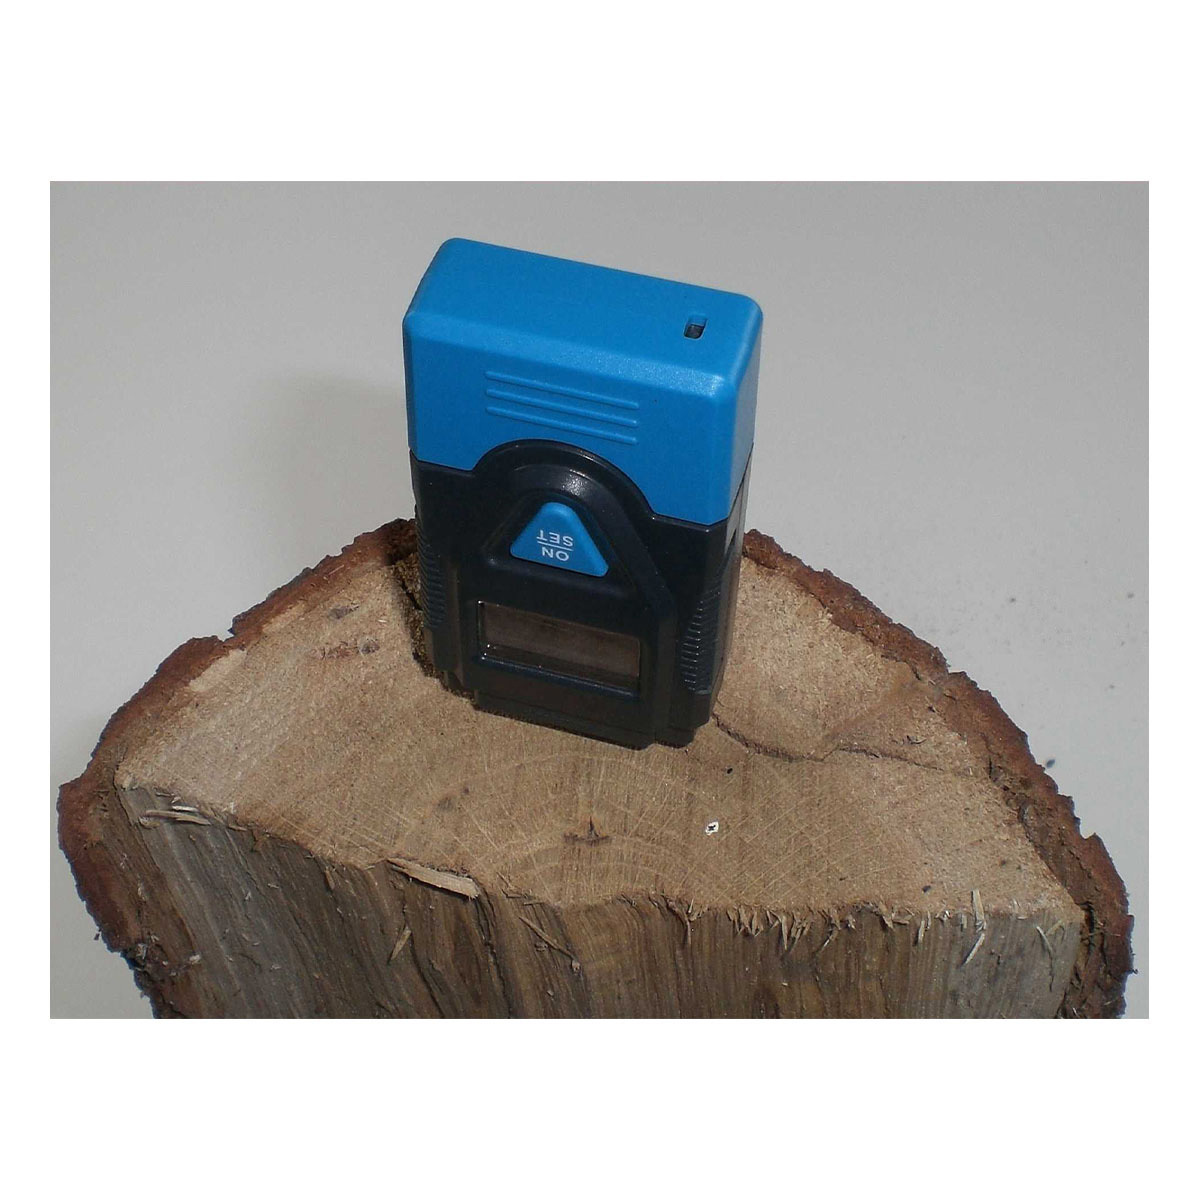 30-5502-materialfeuchtemessgerät-humidcheck-mini-anwendung1-1200x1200px.jpg